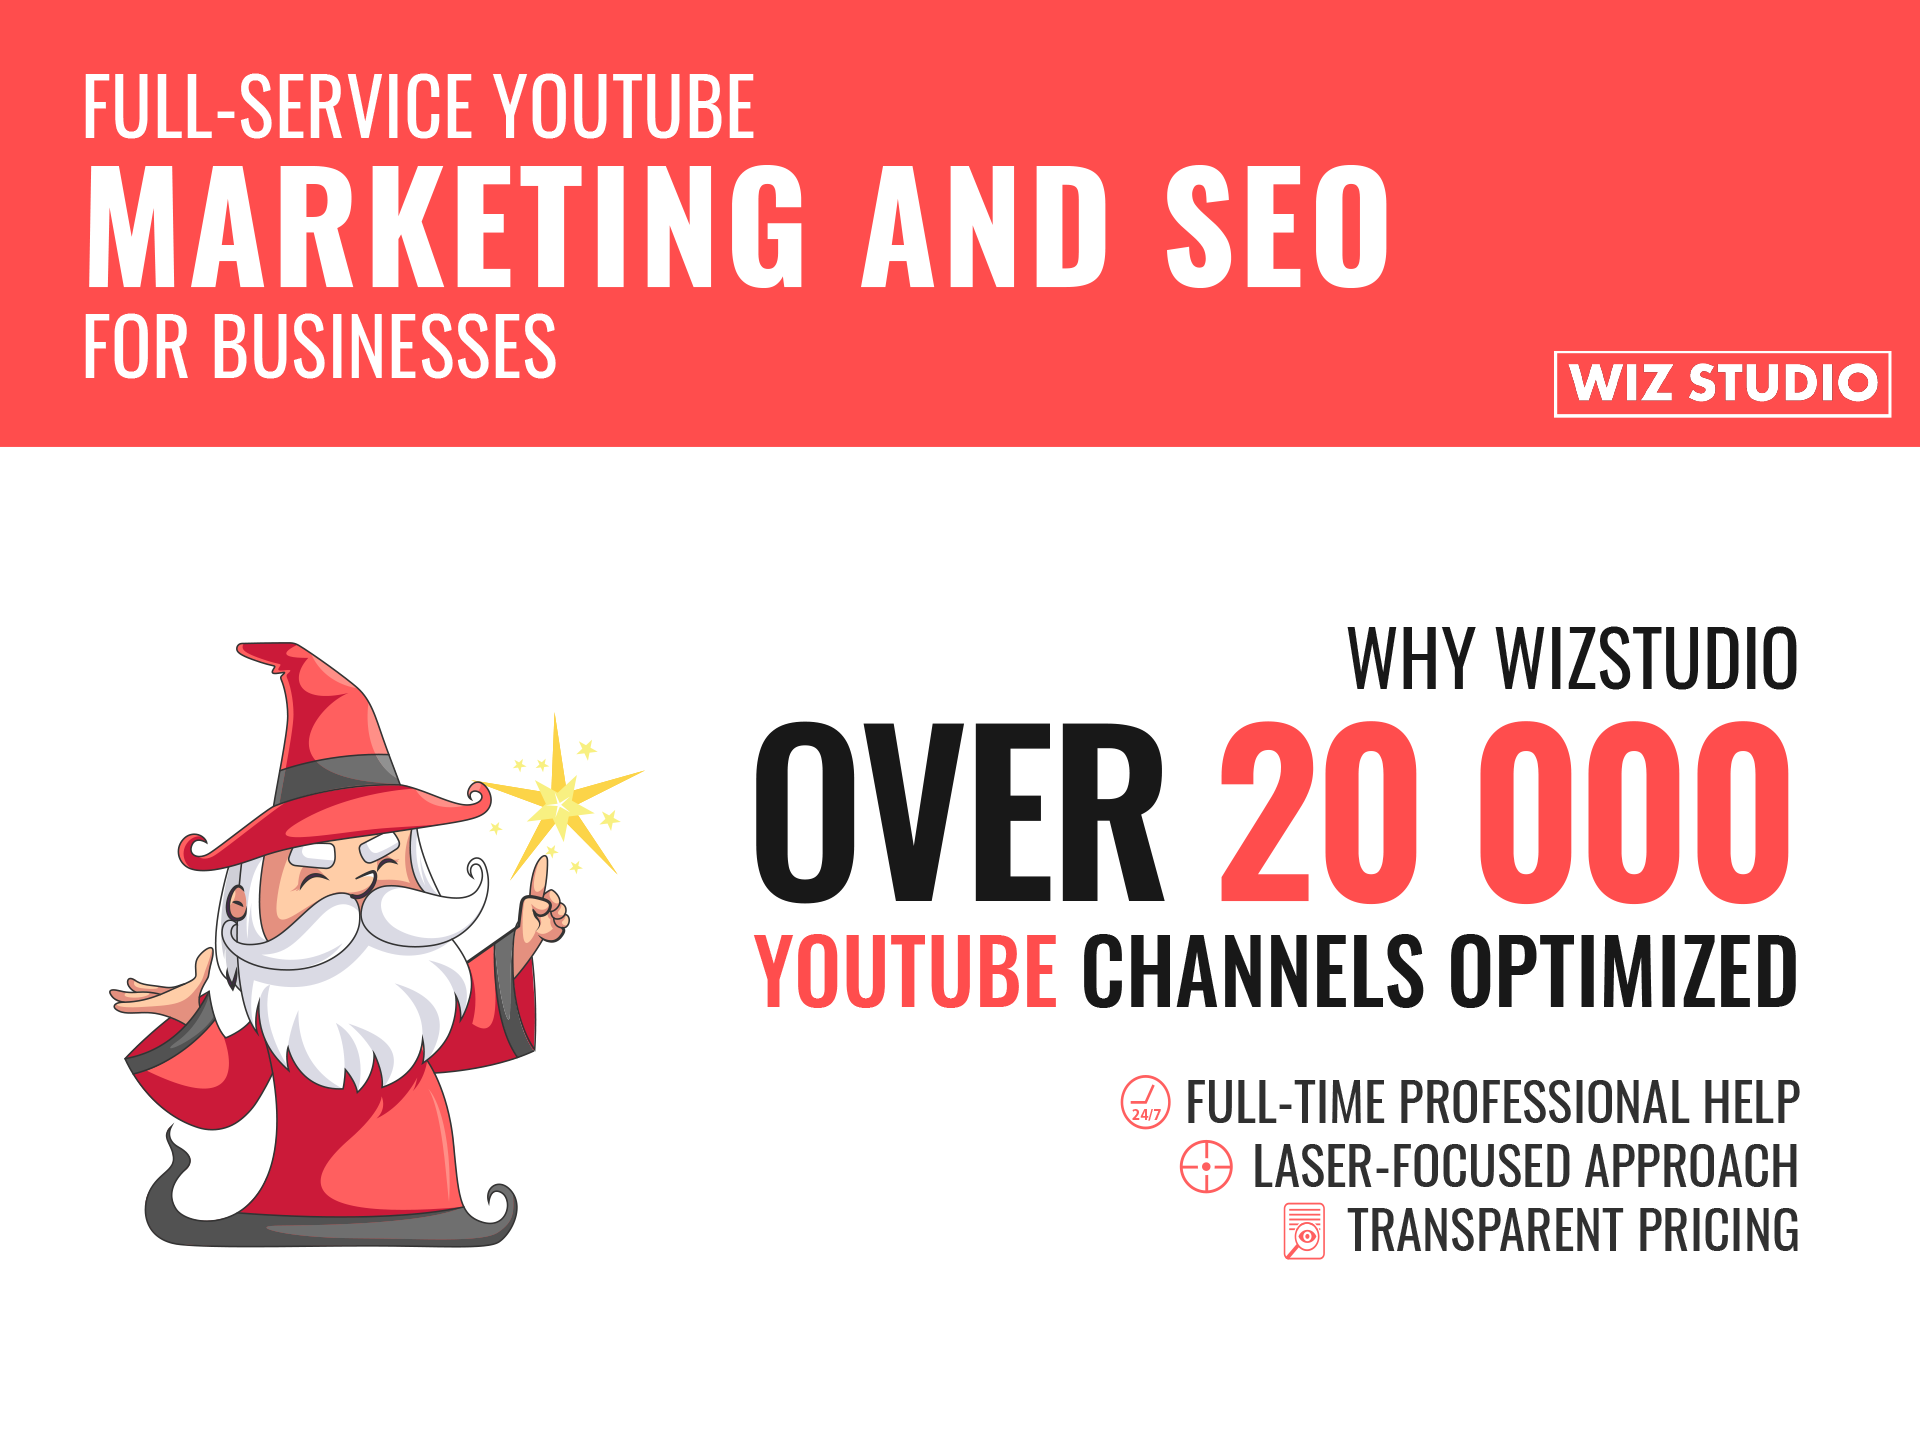 wizstudio youtube seo services